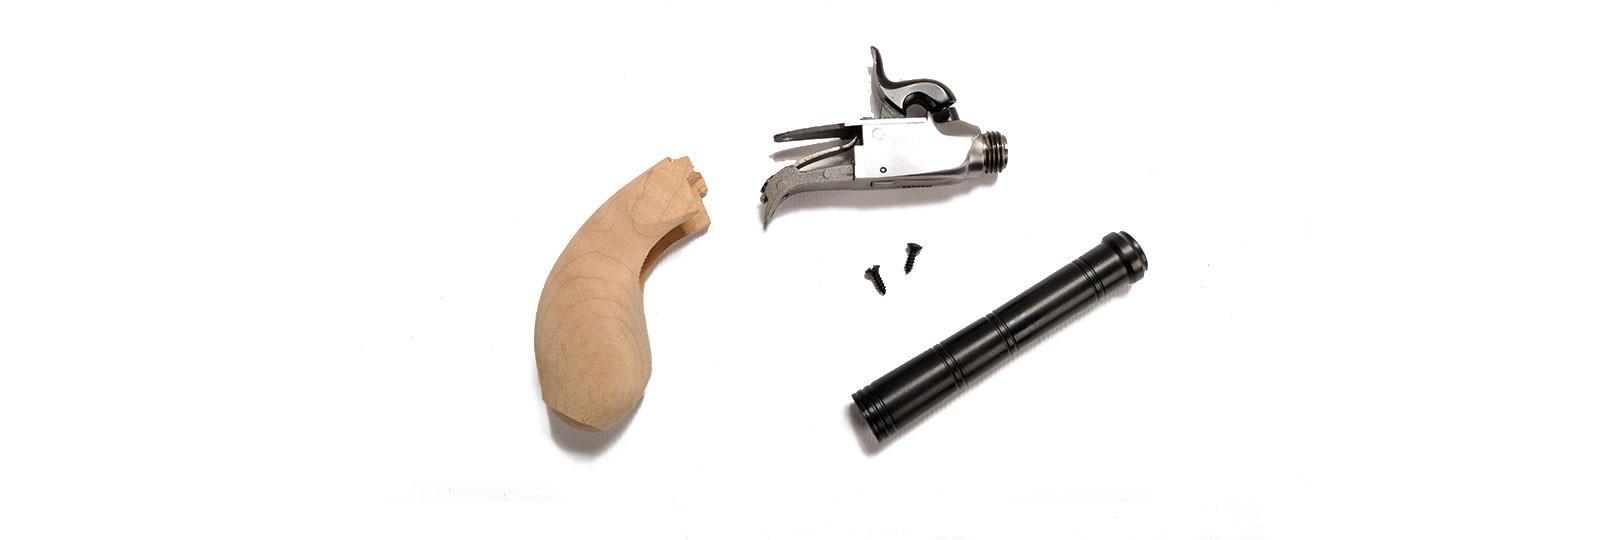 Kit pistola Derringer Liegi Pocket